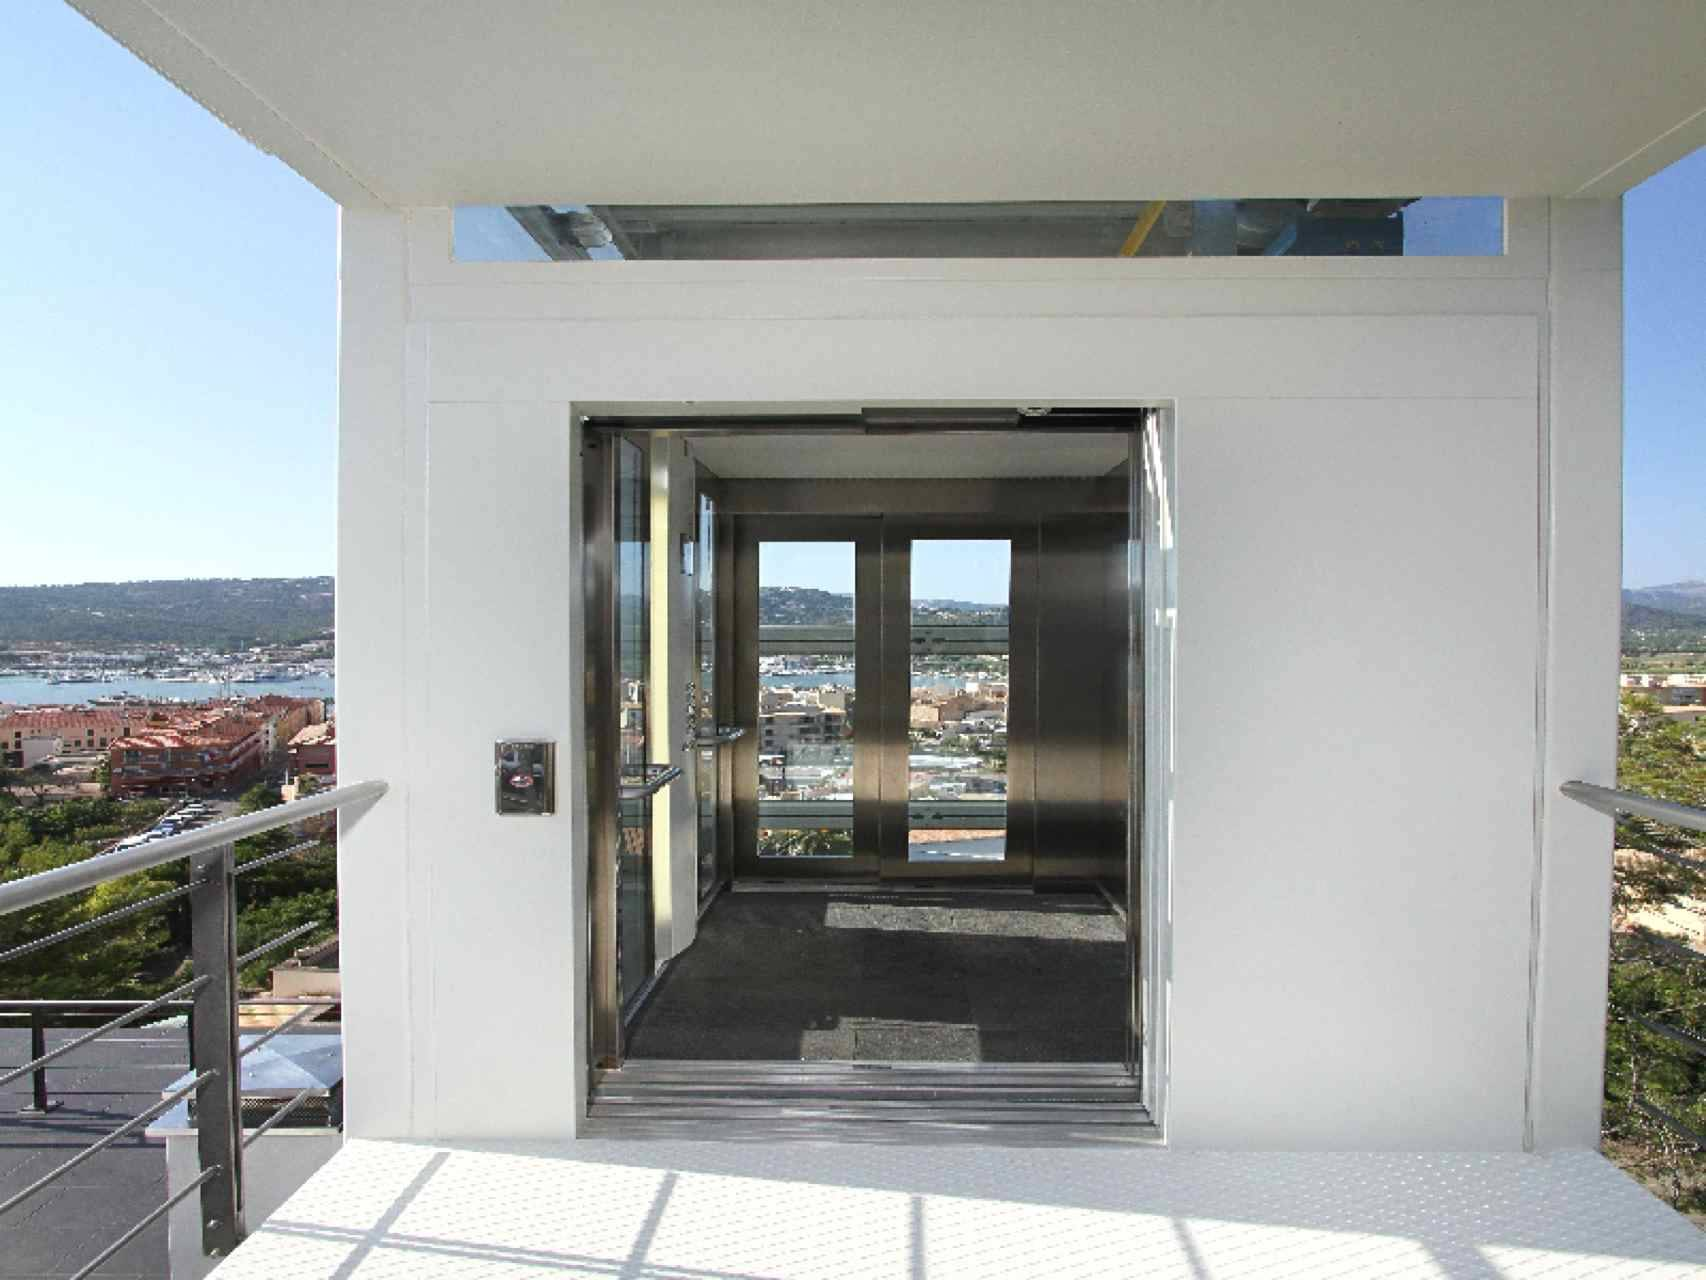 01-04 Bauhaus Villa Mallorca Südwesten Bild 10